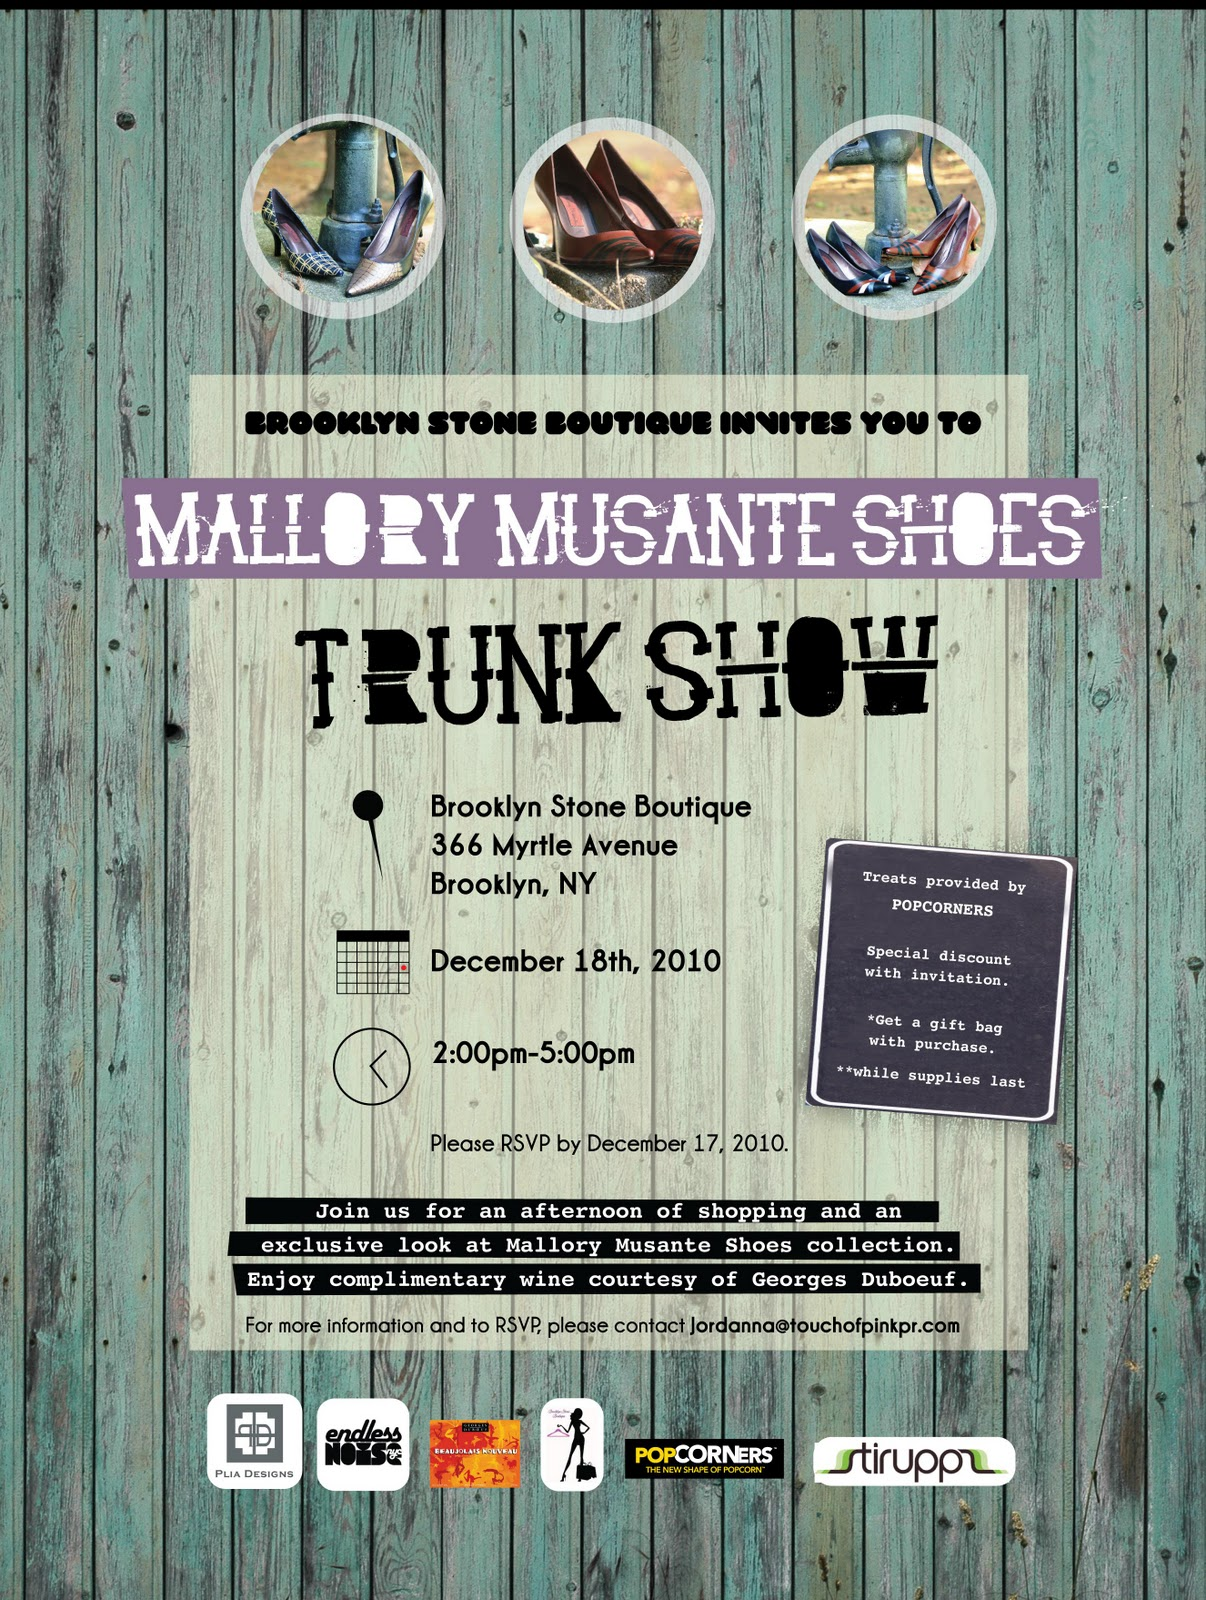 http://3.bp.blogspot.com/_pkt-6dhTSn4/TQj78iFMSuI/AAAAAAAABw8/WAScdtoTMoU/s1600/mmshoes_trunk_show_invite.JPG